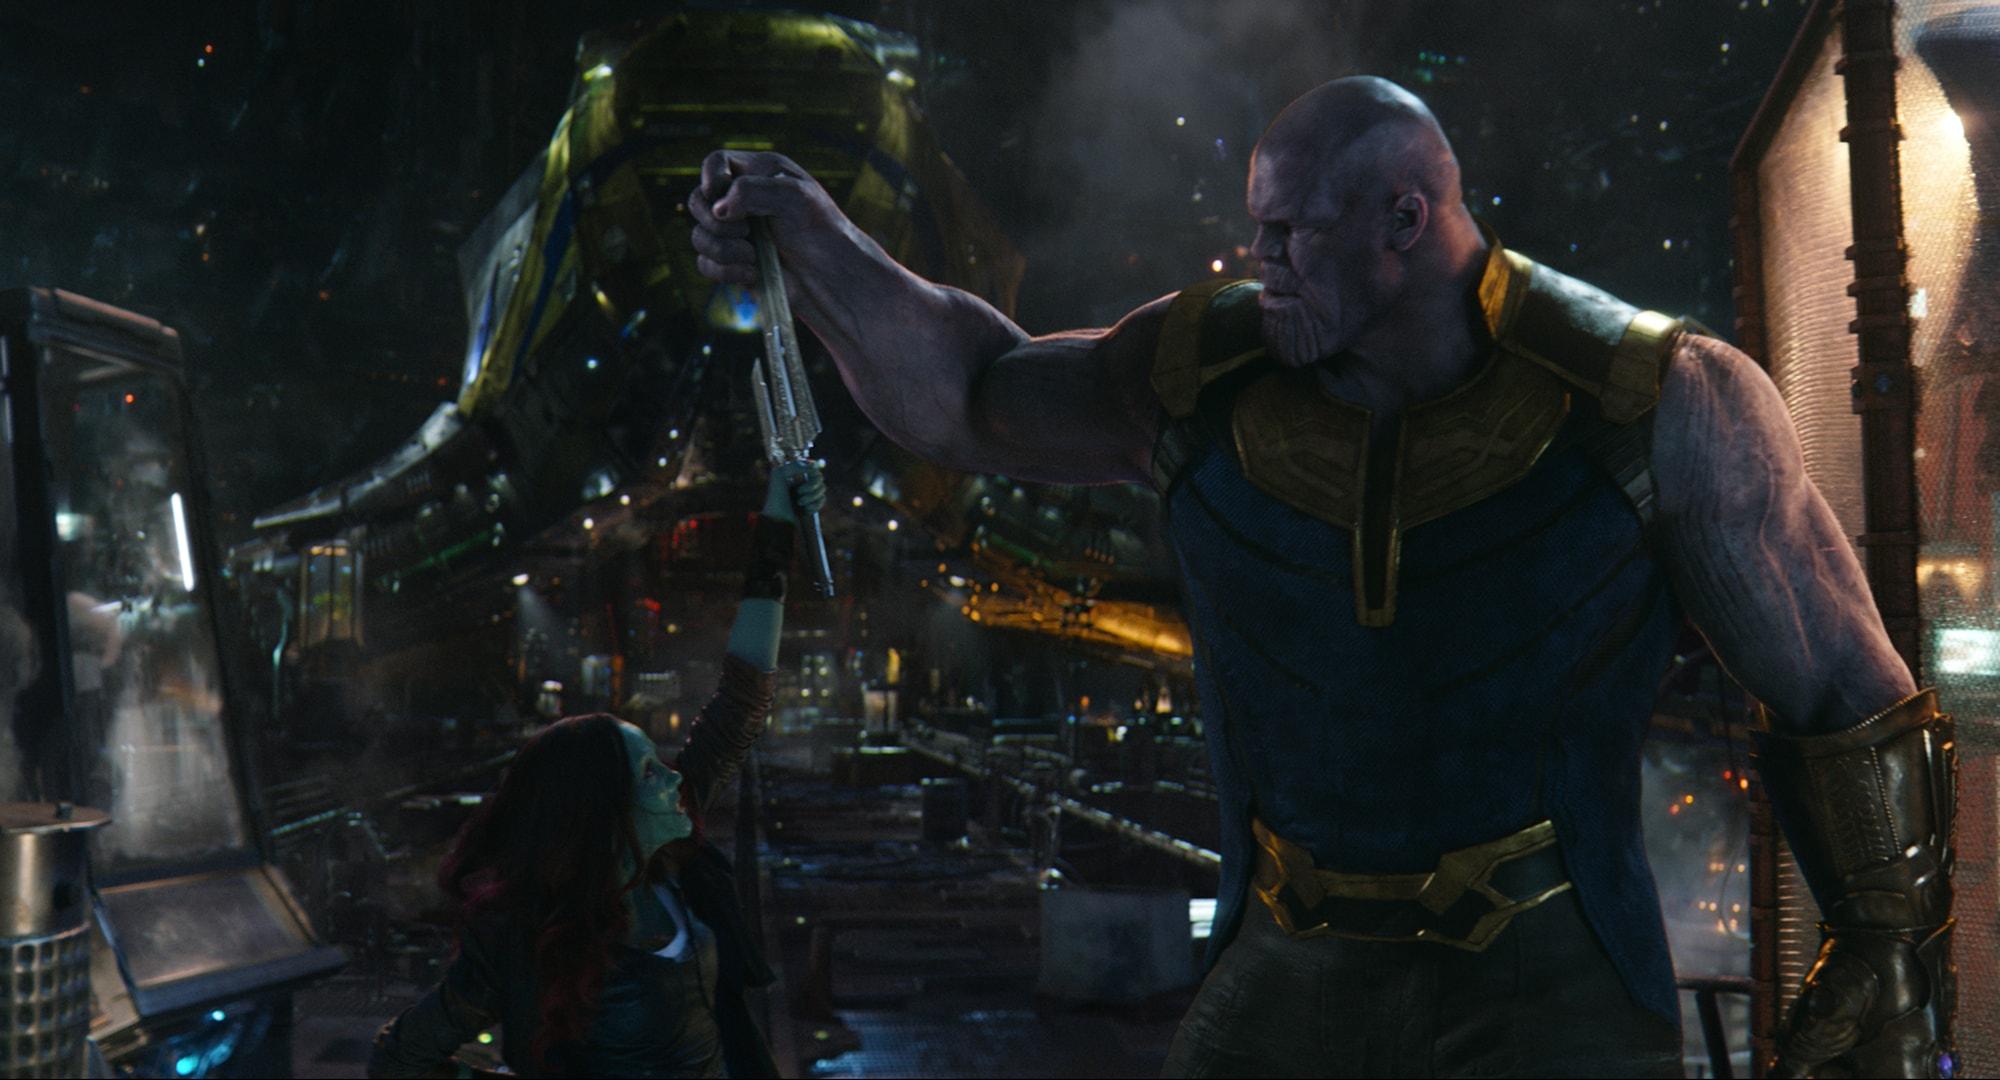 Gamora as Thanos Good Girls Go Bad series fantasy pin Glitch Pins LE 35